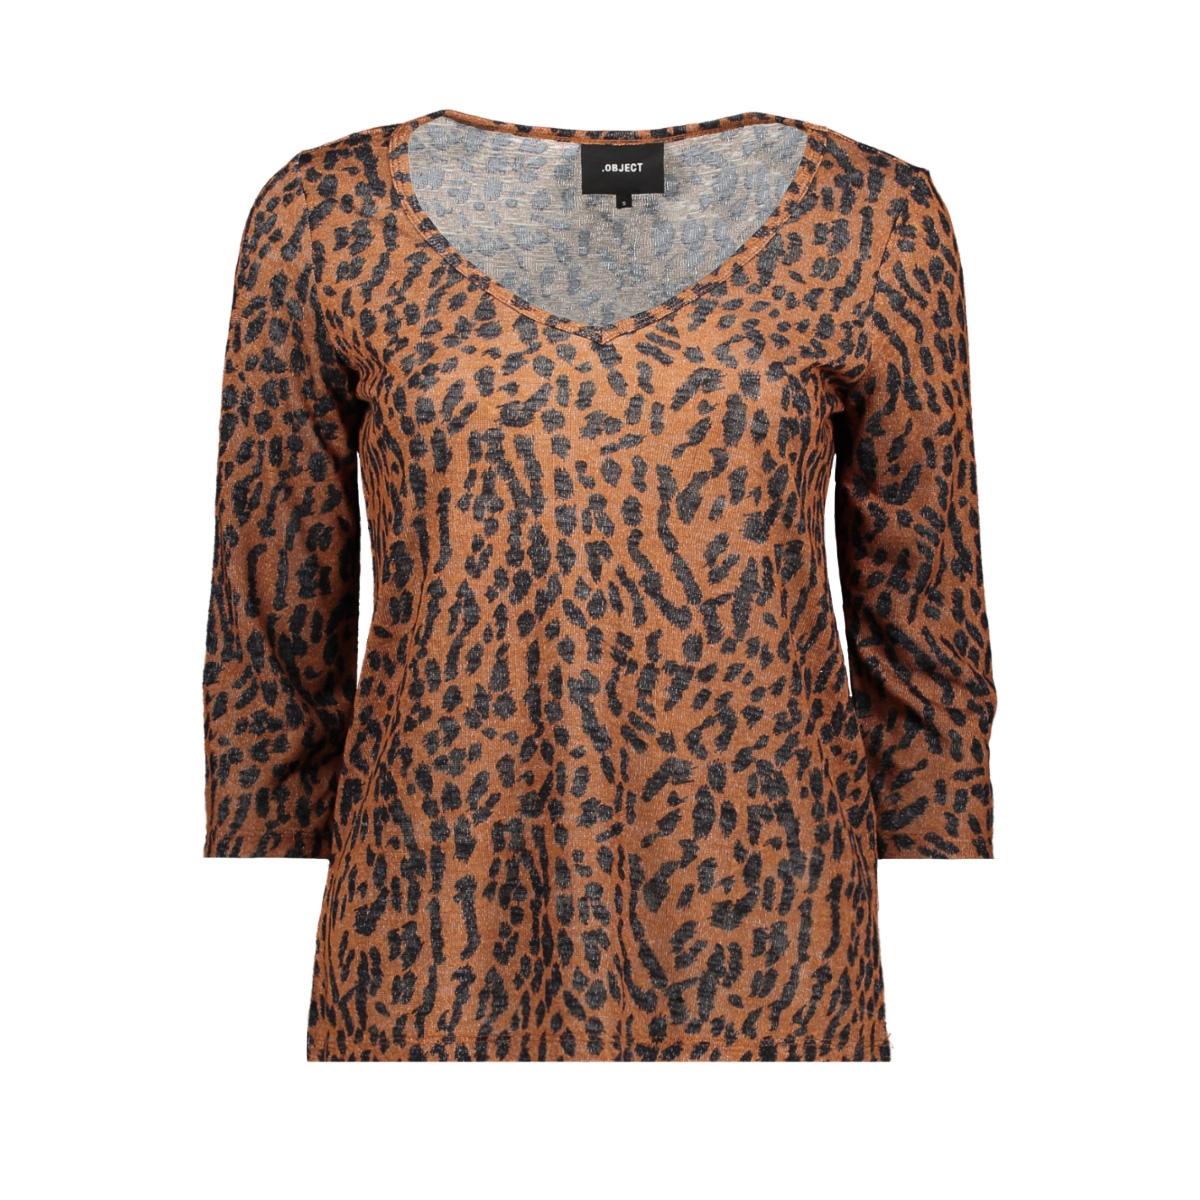 objtessi slub 3/4 top aop seasonal 23030425 object t-shirt brown patina/black